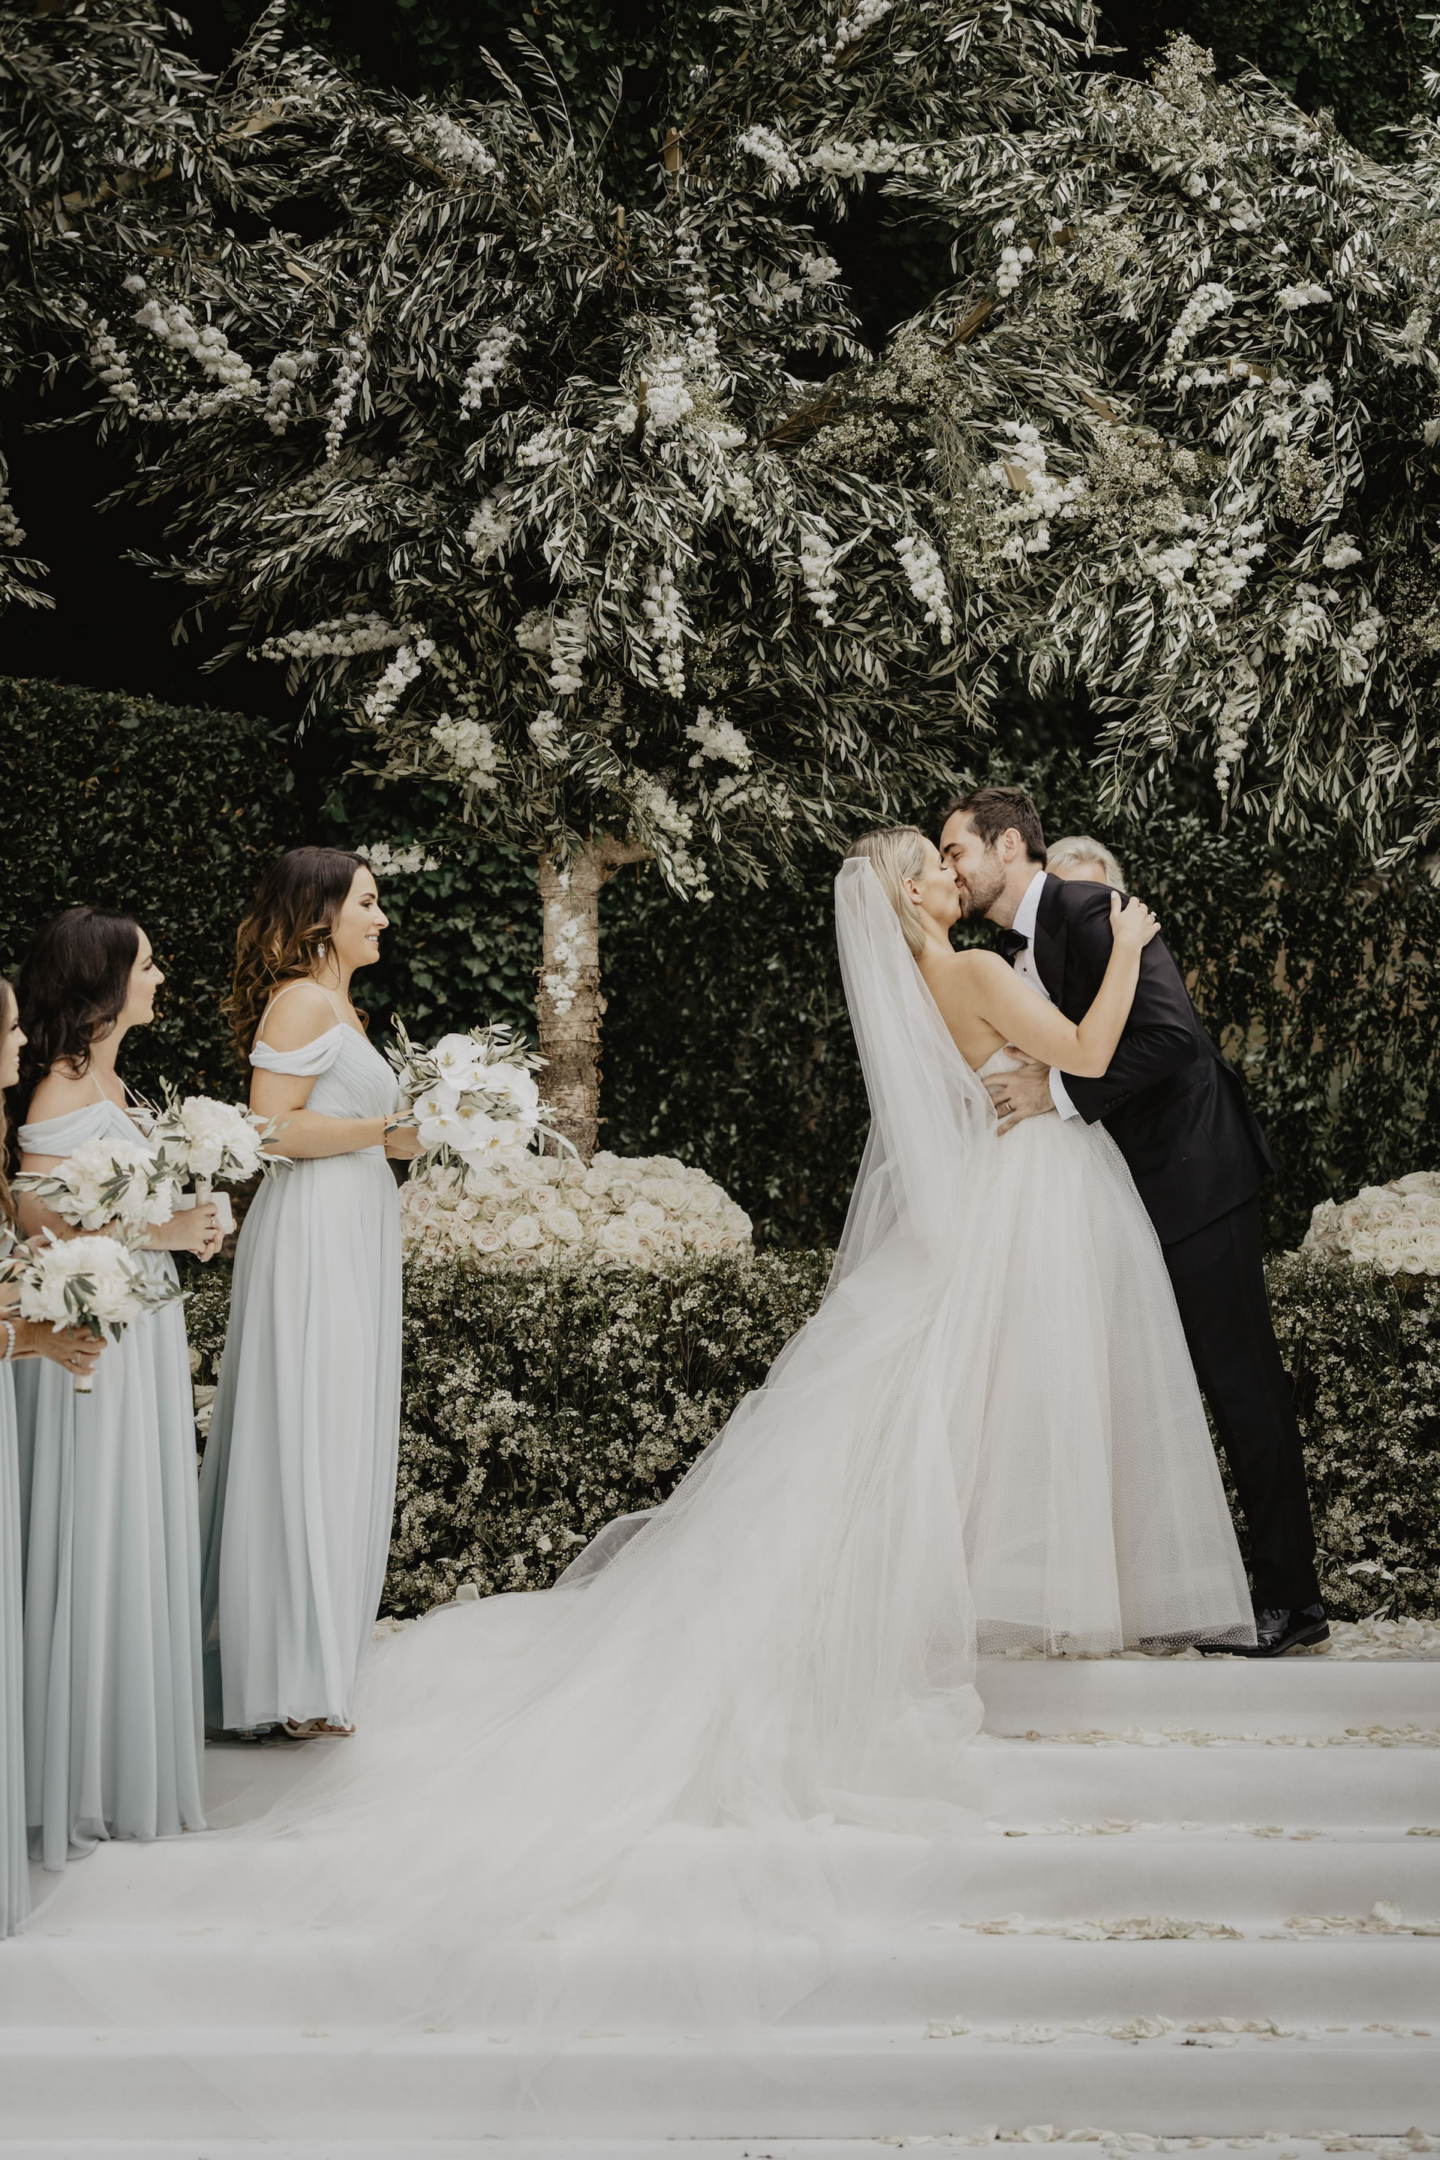 A sparkling wedding in the shore of the Arno - 44 :: A sparkling wedding on the shore of the Arno :: Luxury wedding photography - 43 :: A sparkling wedding in the shore of the Arno - 44